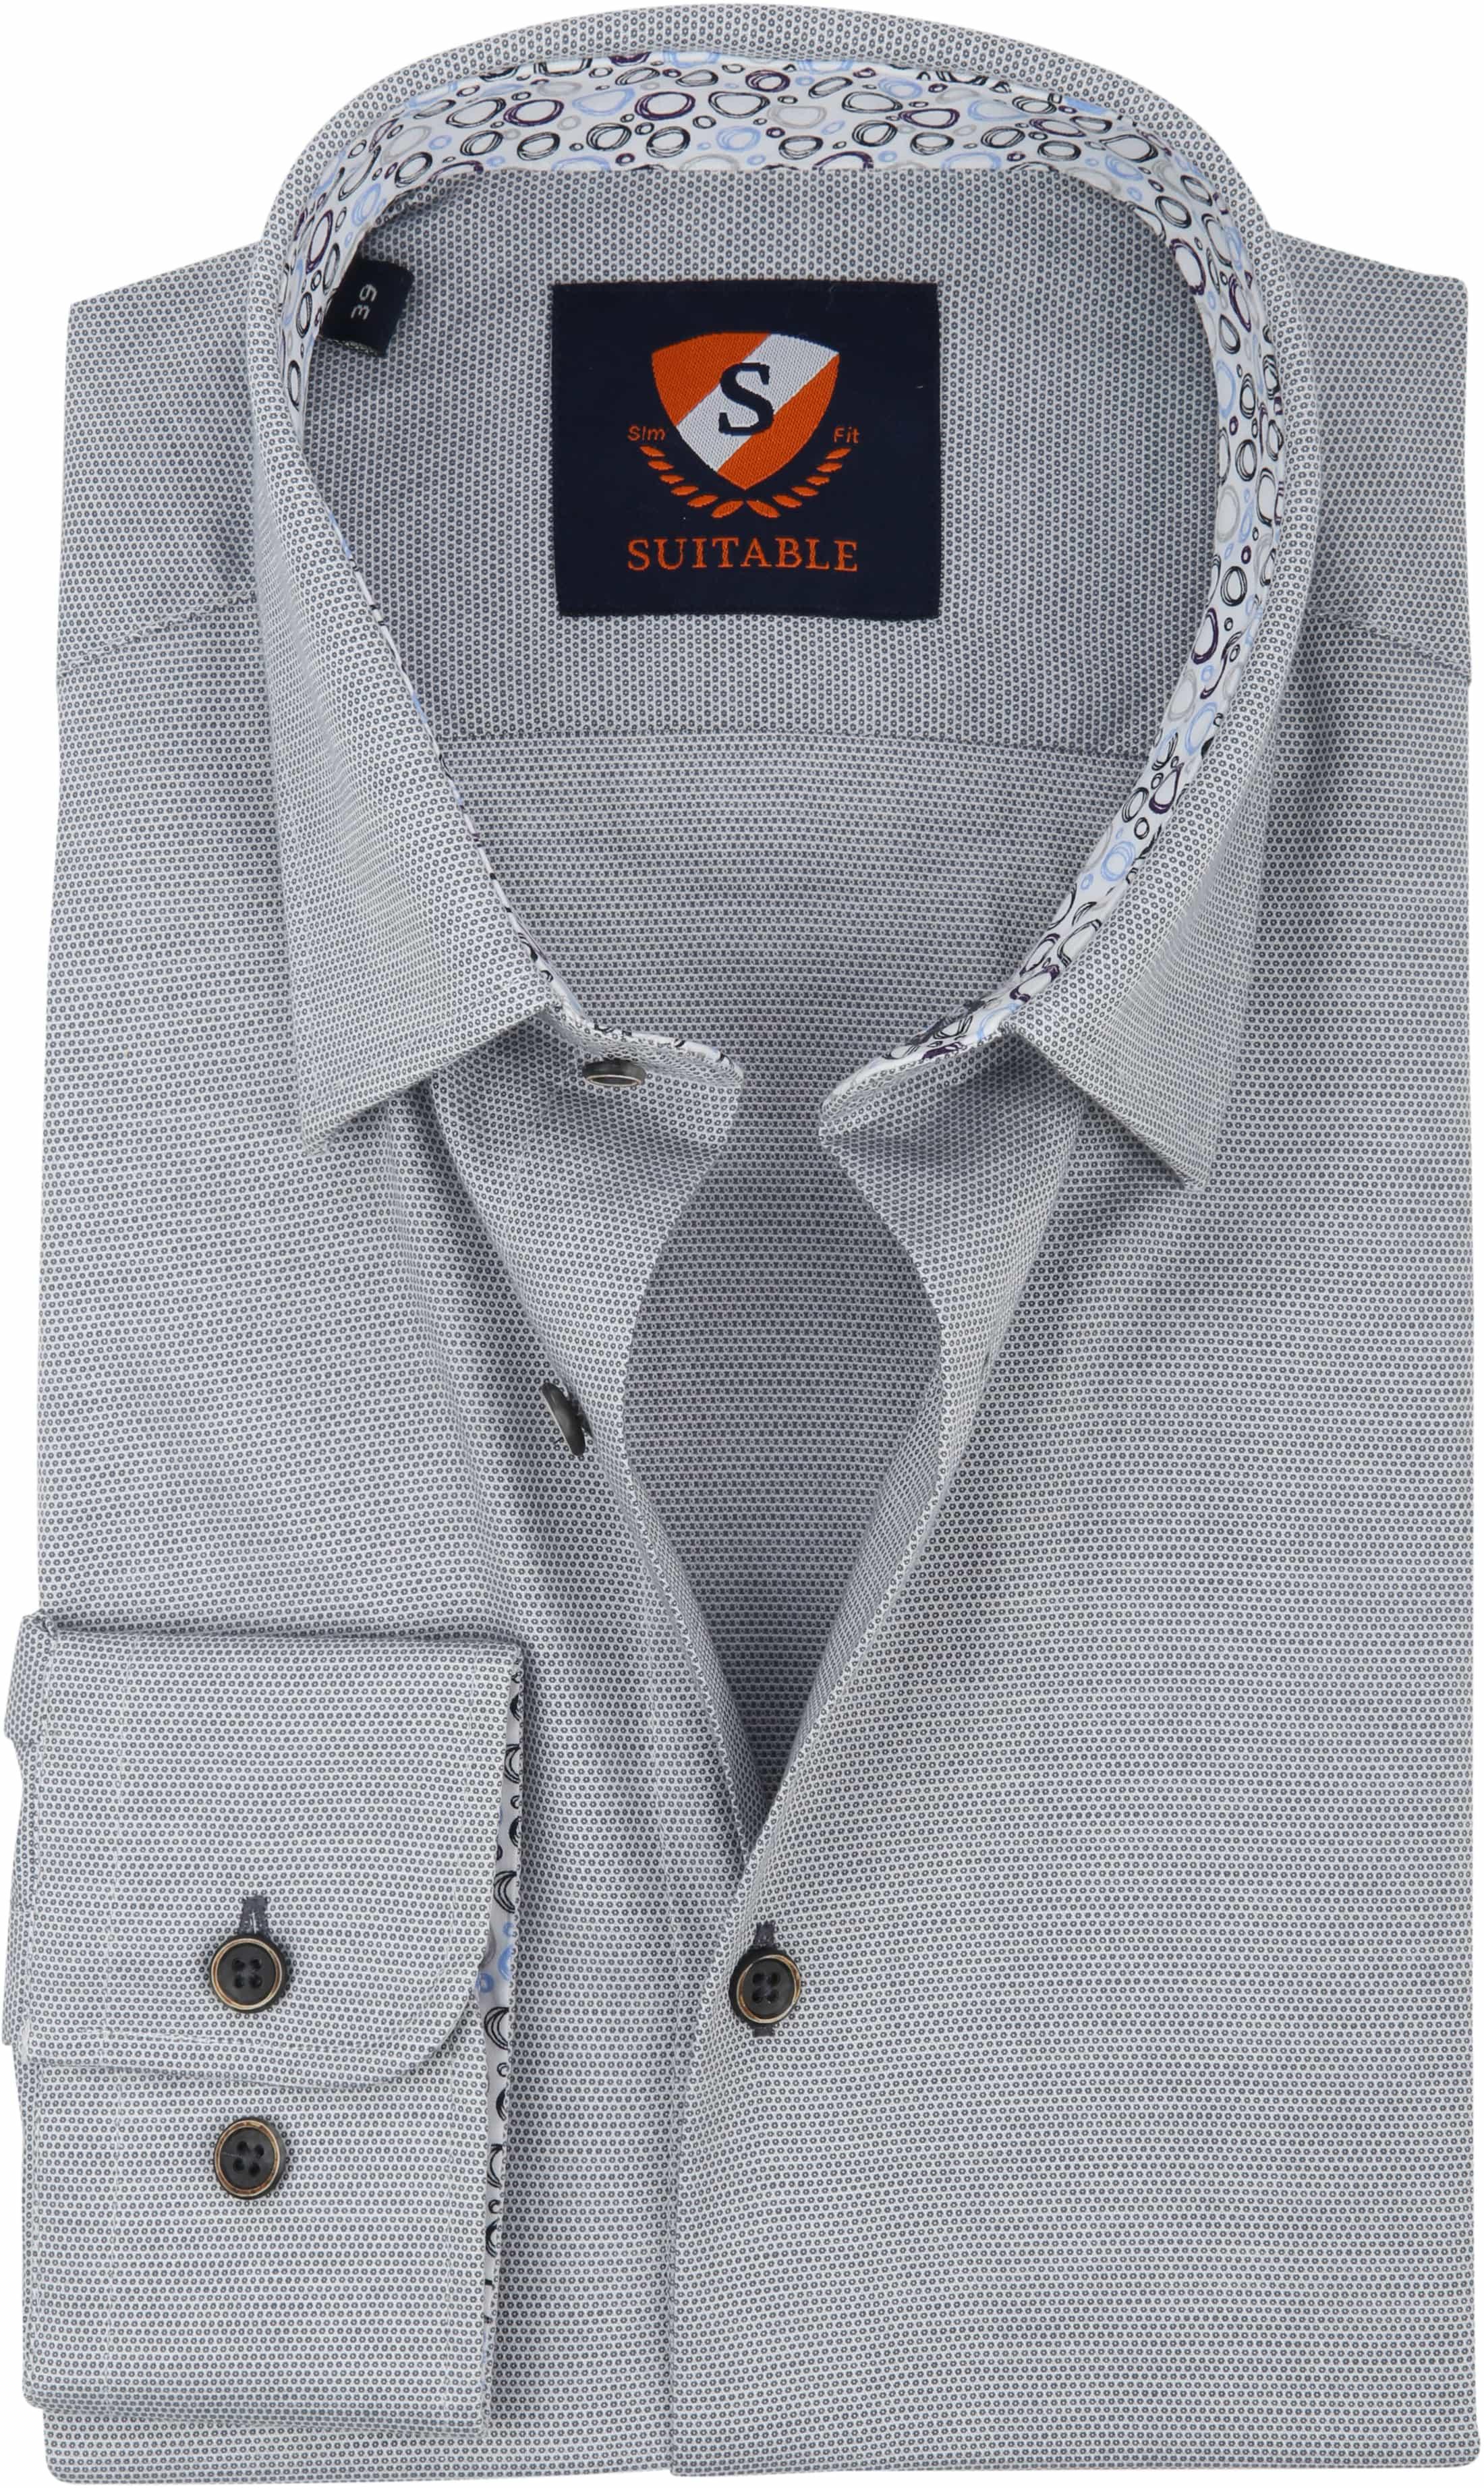 Suitable Shirt HBD Wesley Grey foto 0